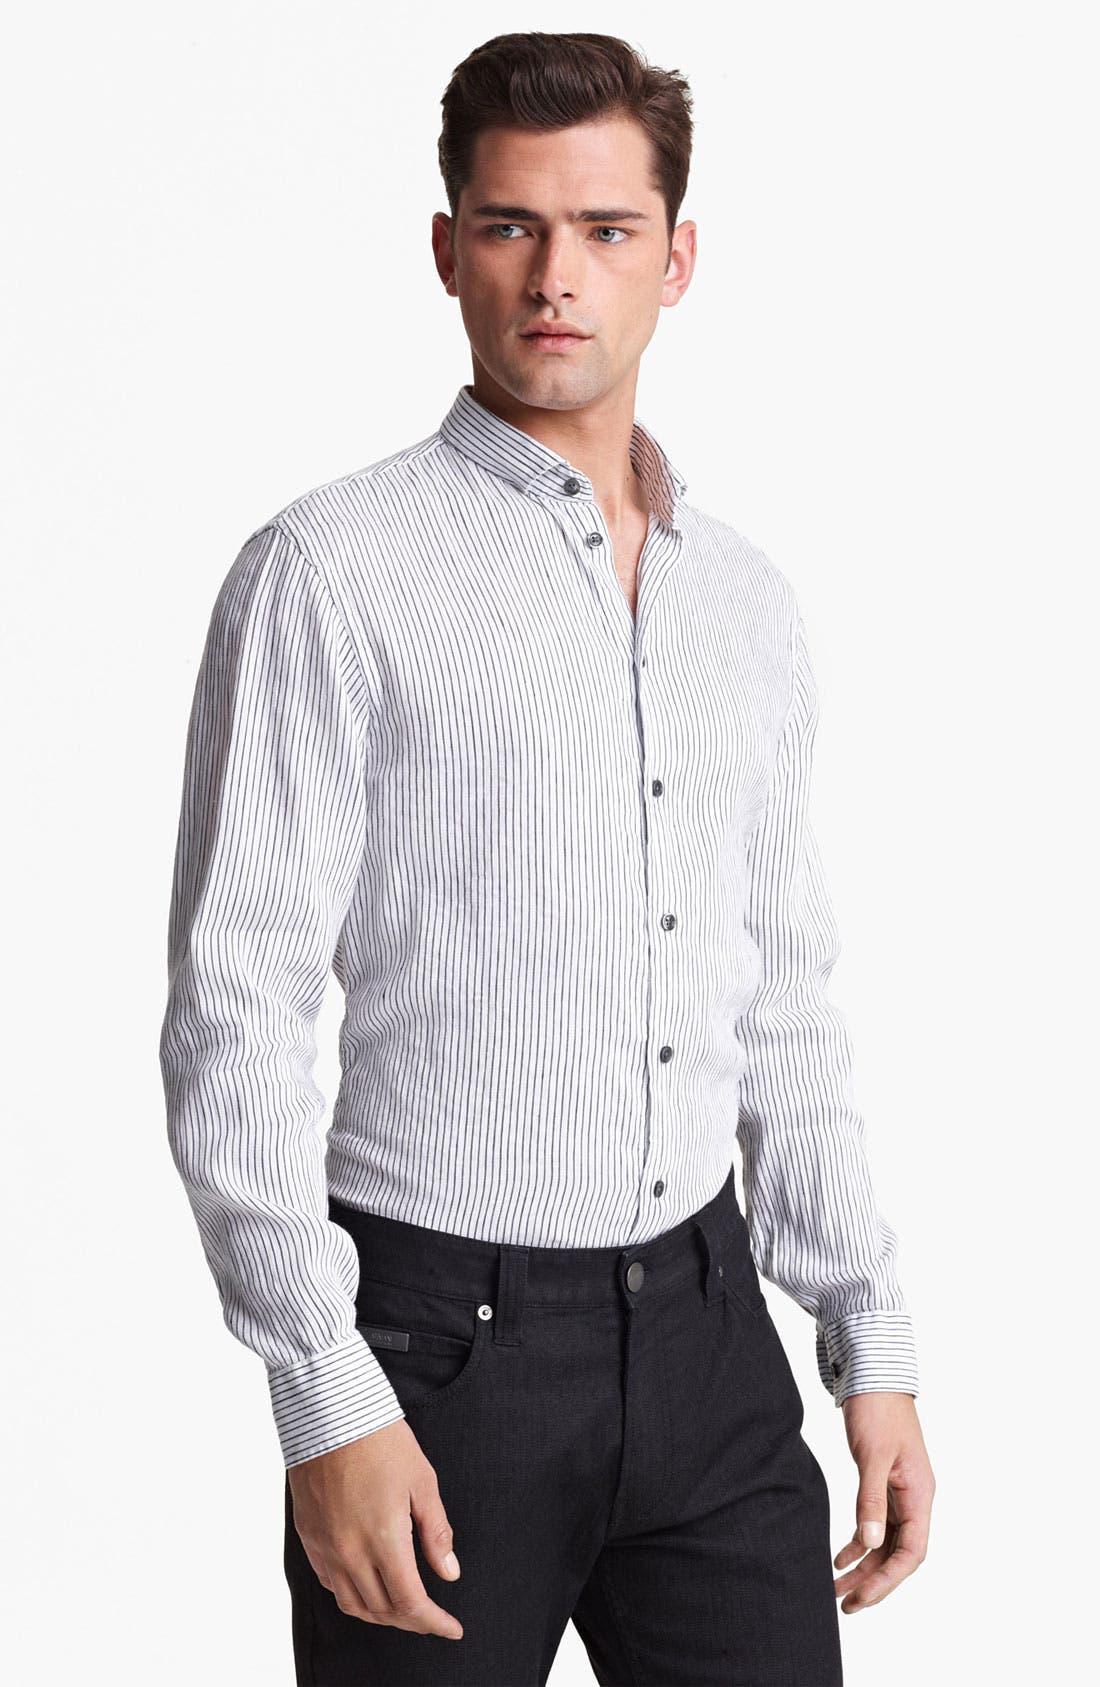 Main Image - Armani Collezioni Stripe Woven Shirt with Stitched Collar